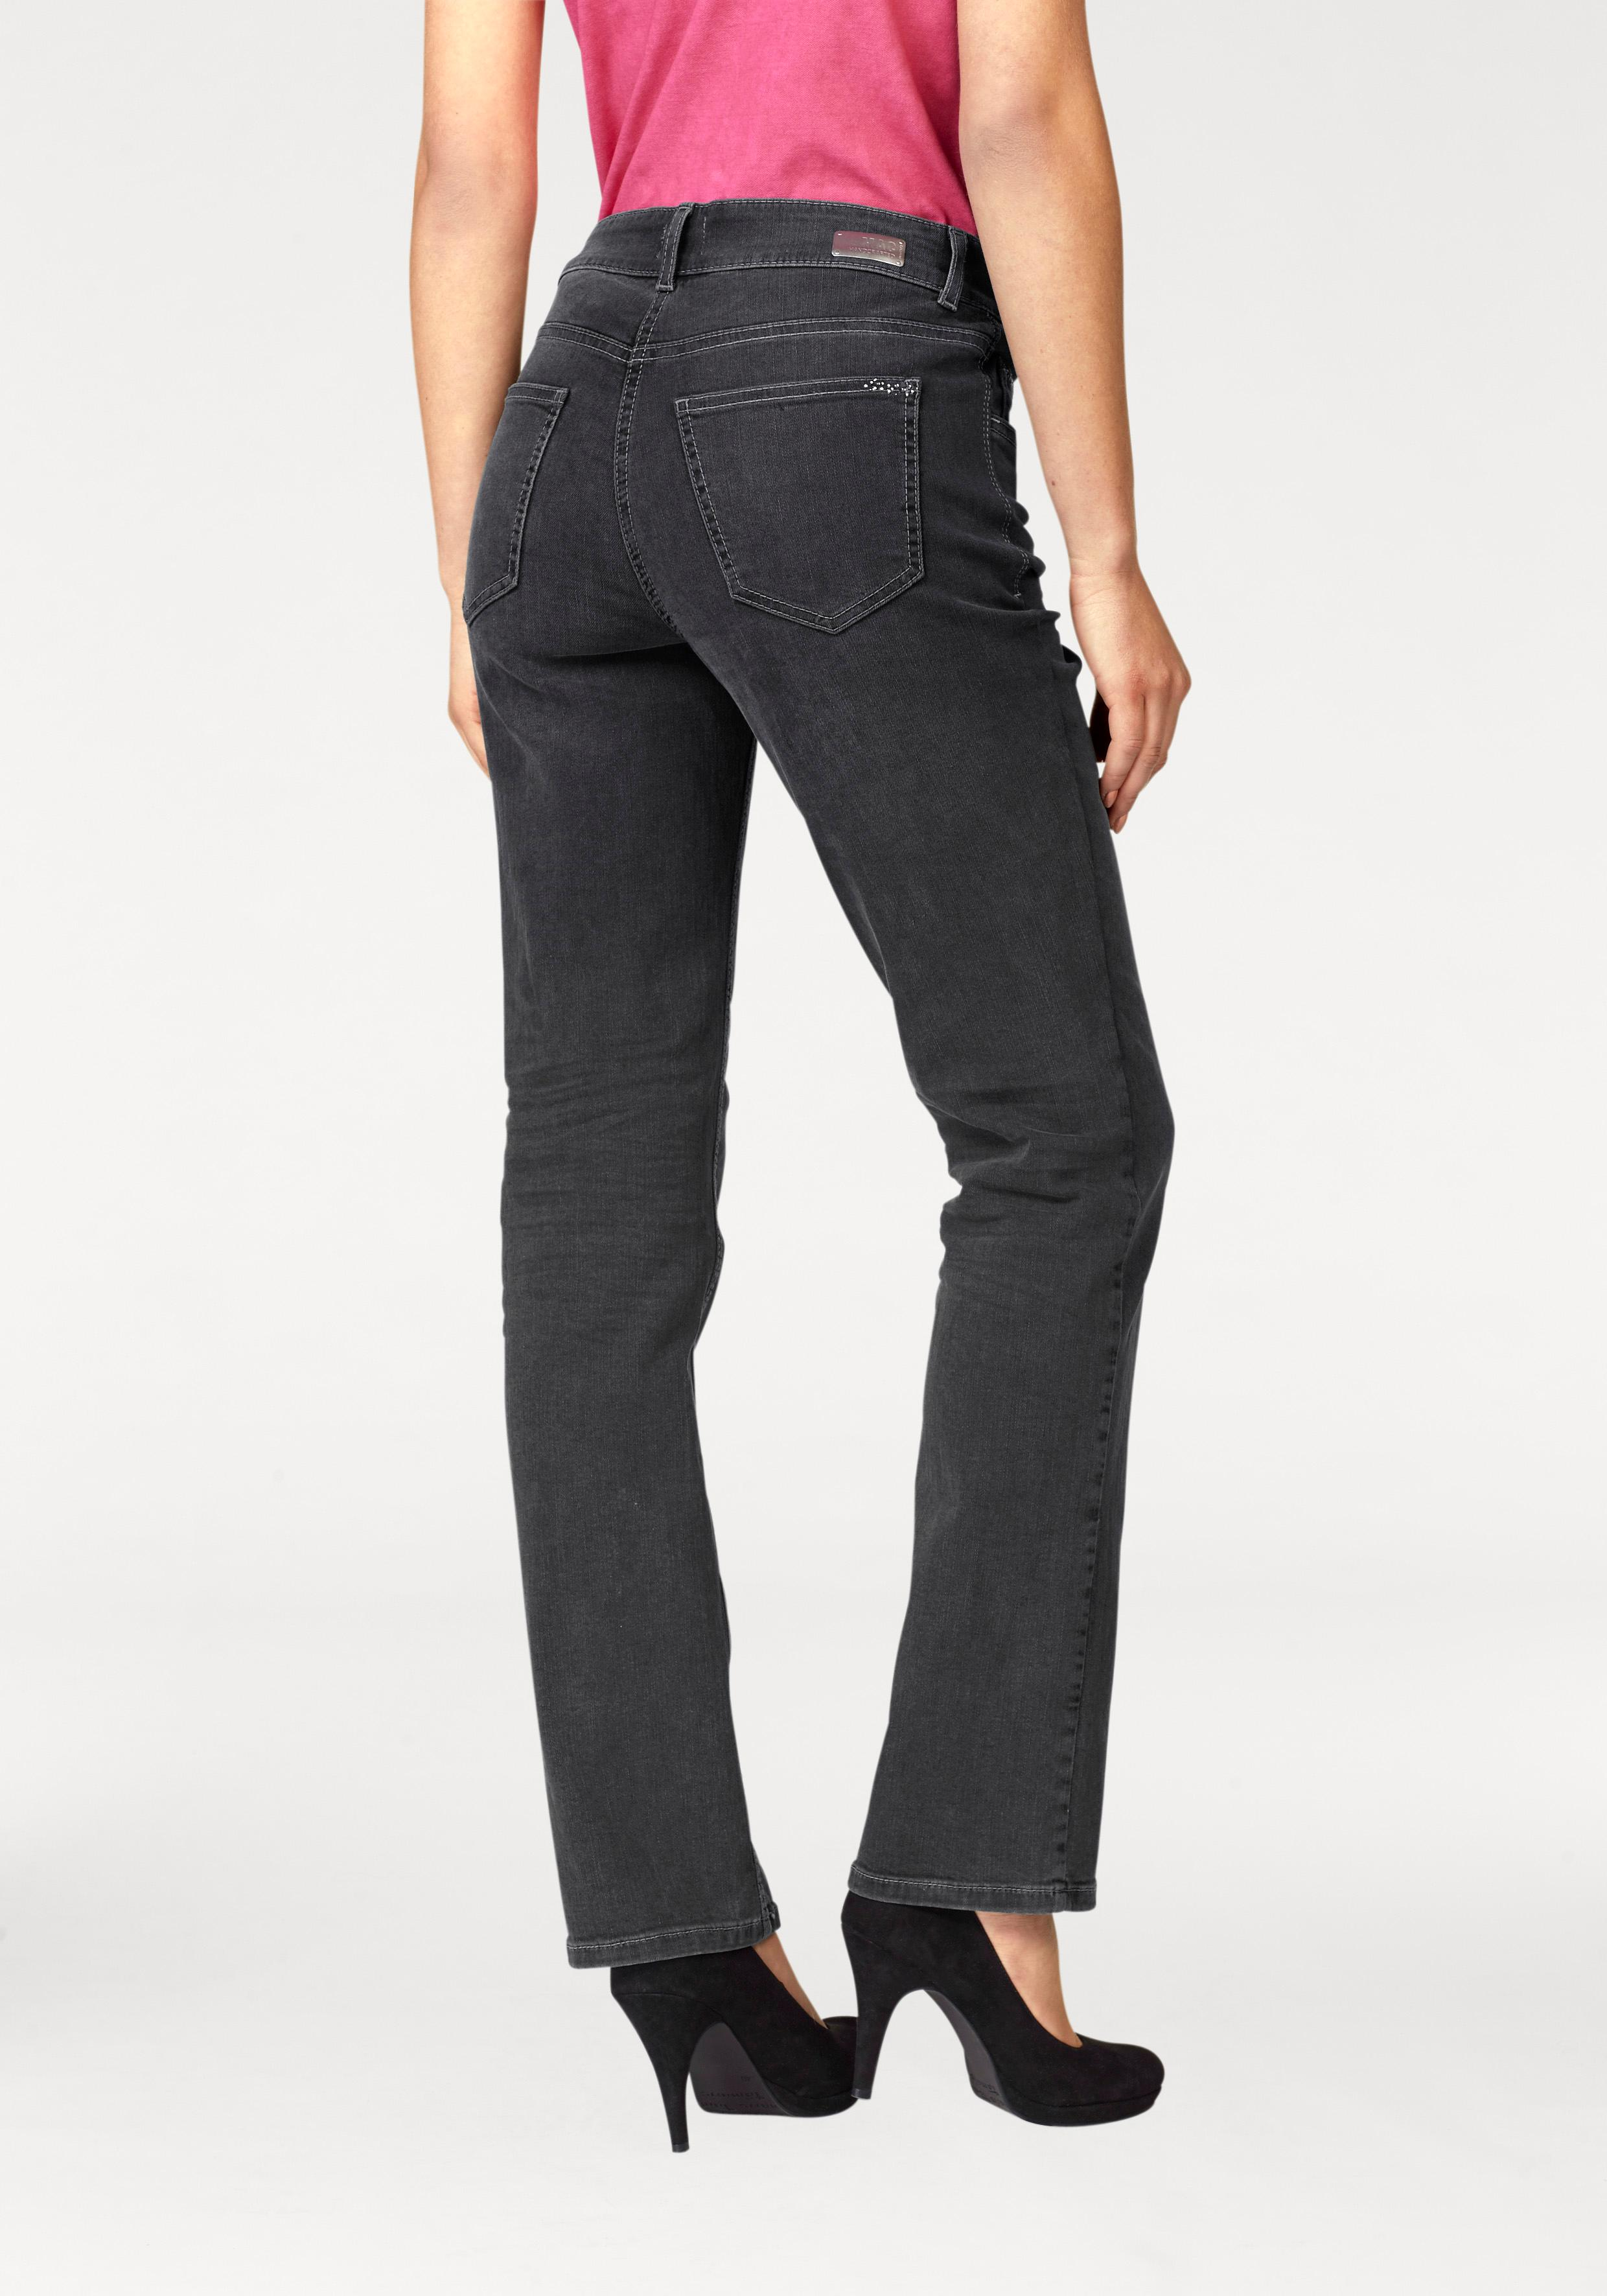 MAC 5-Pocket-Jeans Melanie Glam Pocket   Bekleidung > Jeans > 5-Pocket-Jeans   Schwarz   Mac